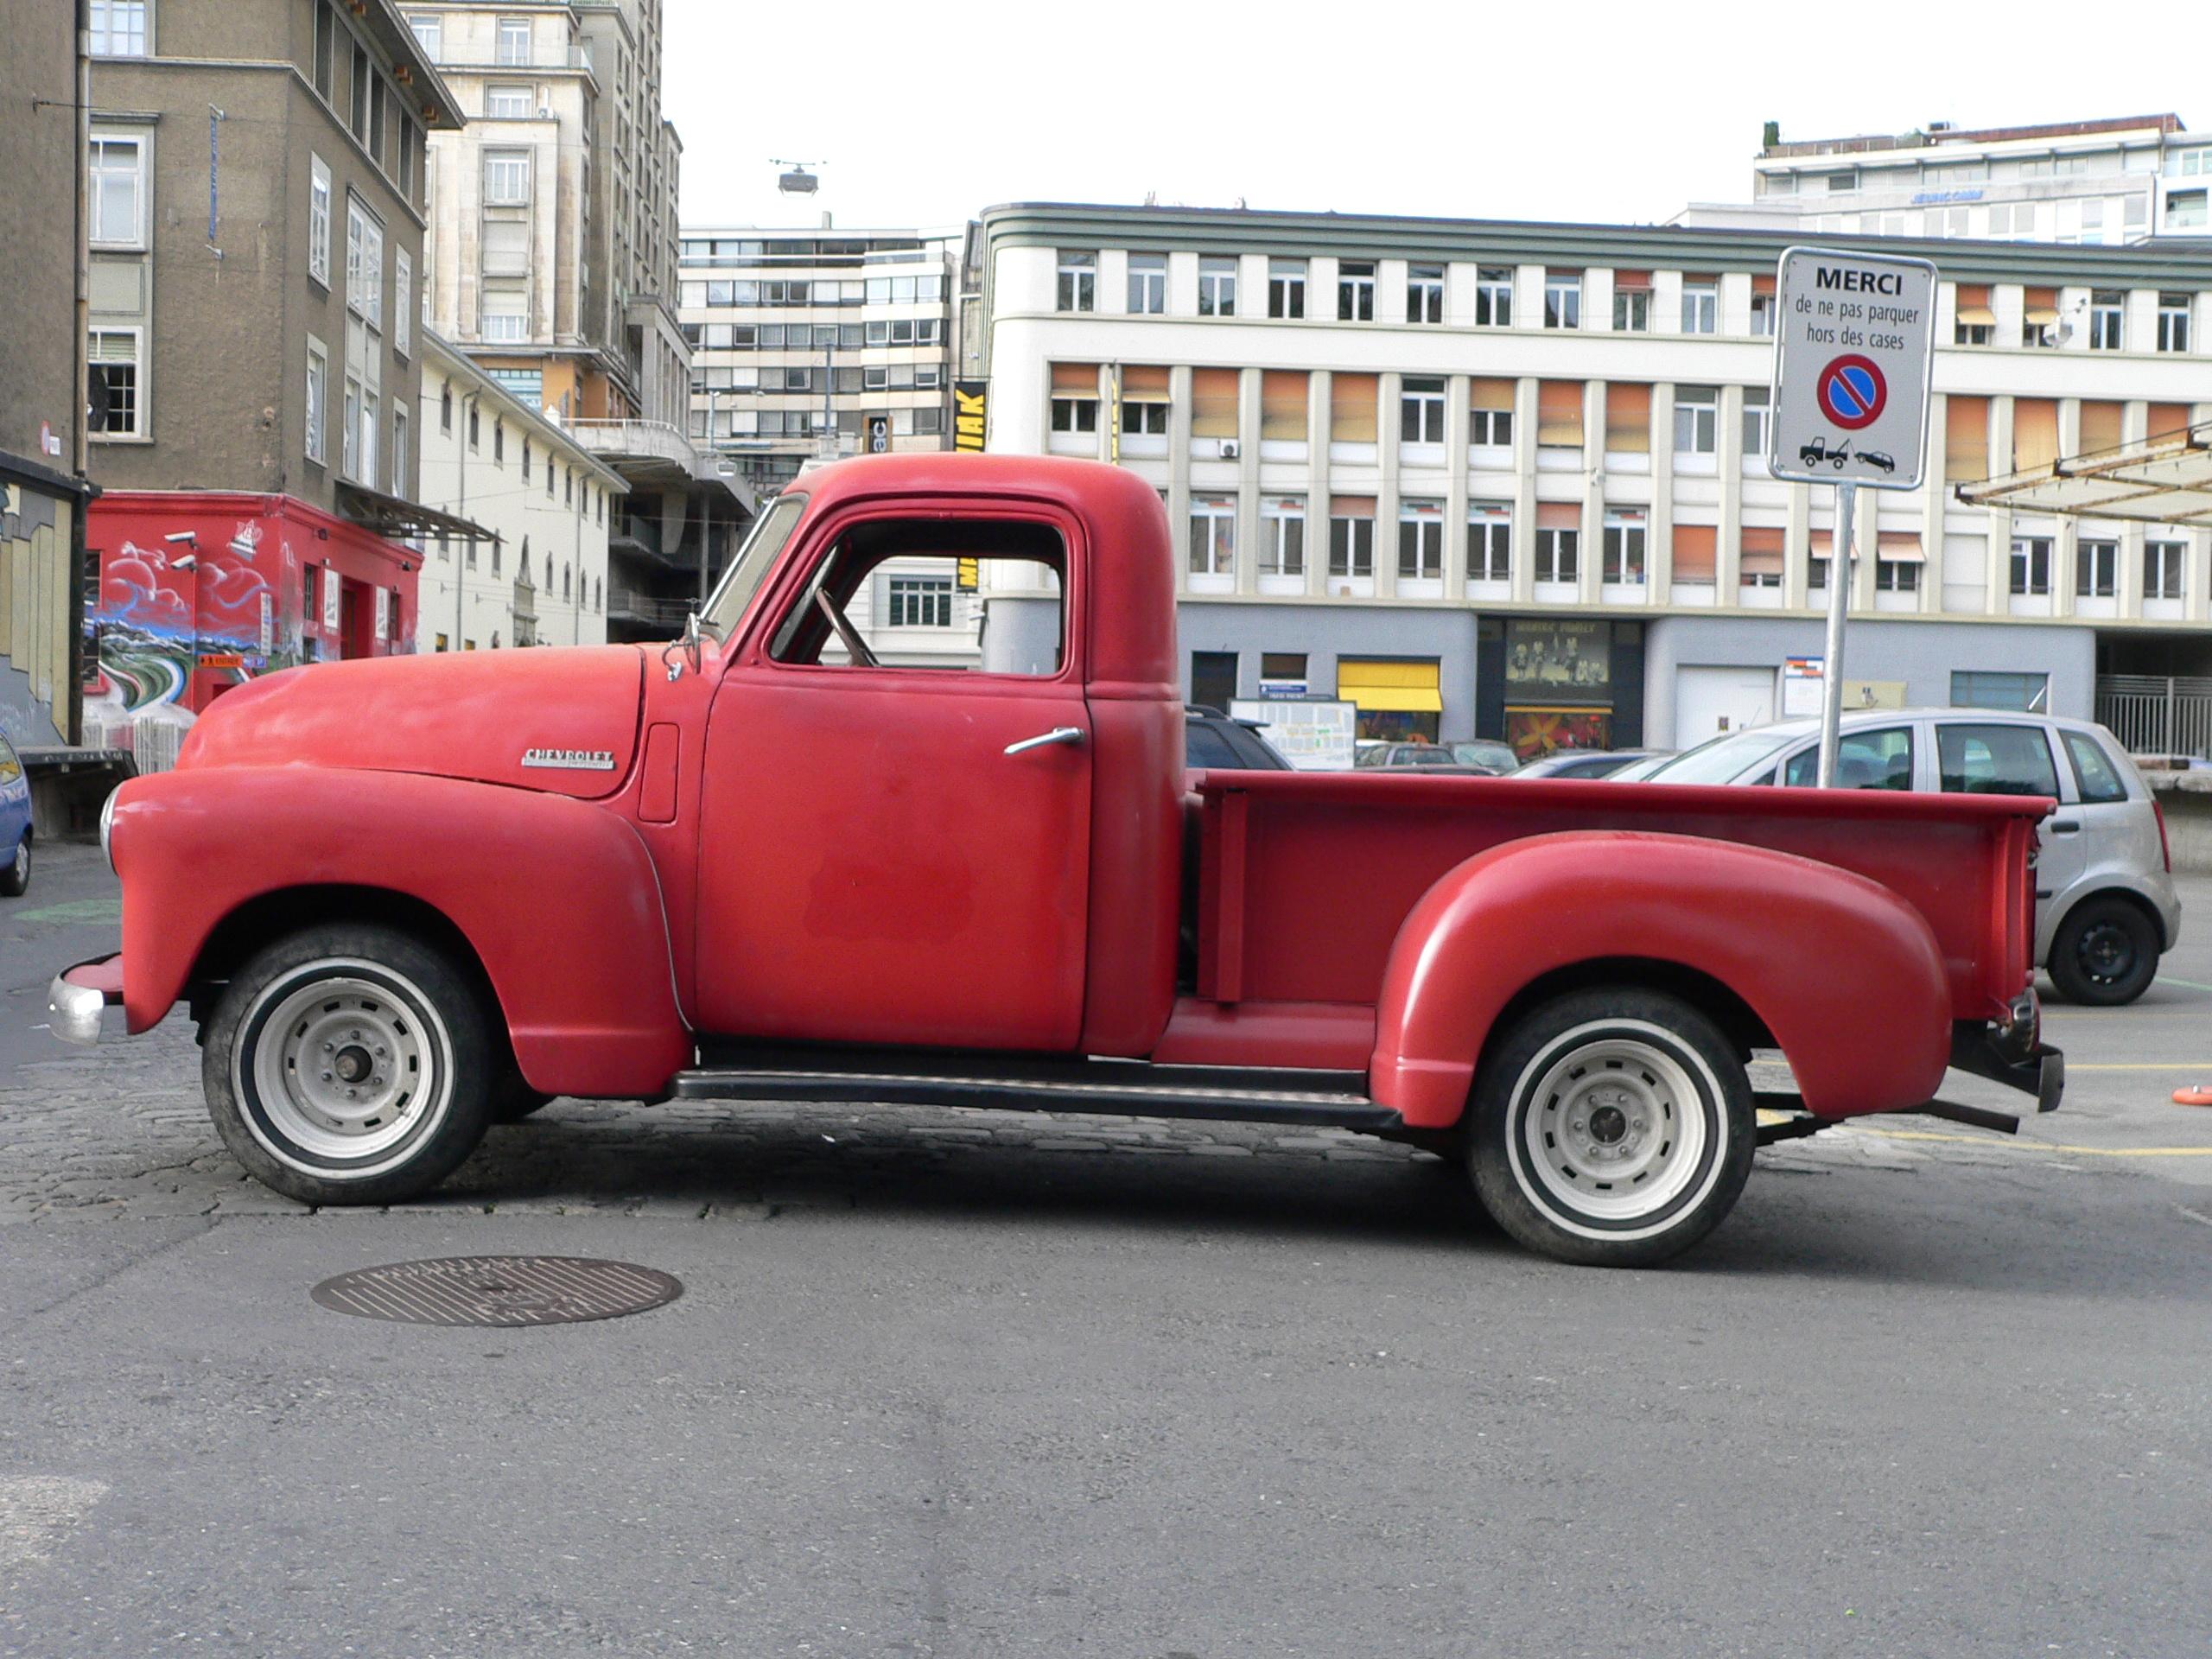 File:Chevrolet-pickup-p1040151.jpg - Wikimedia Commons